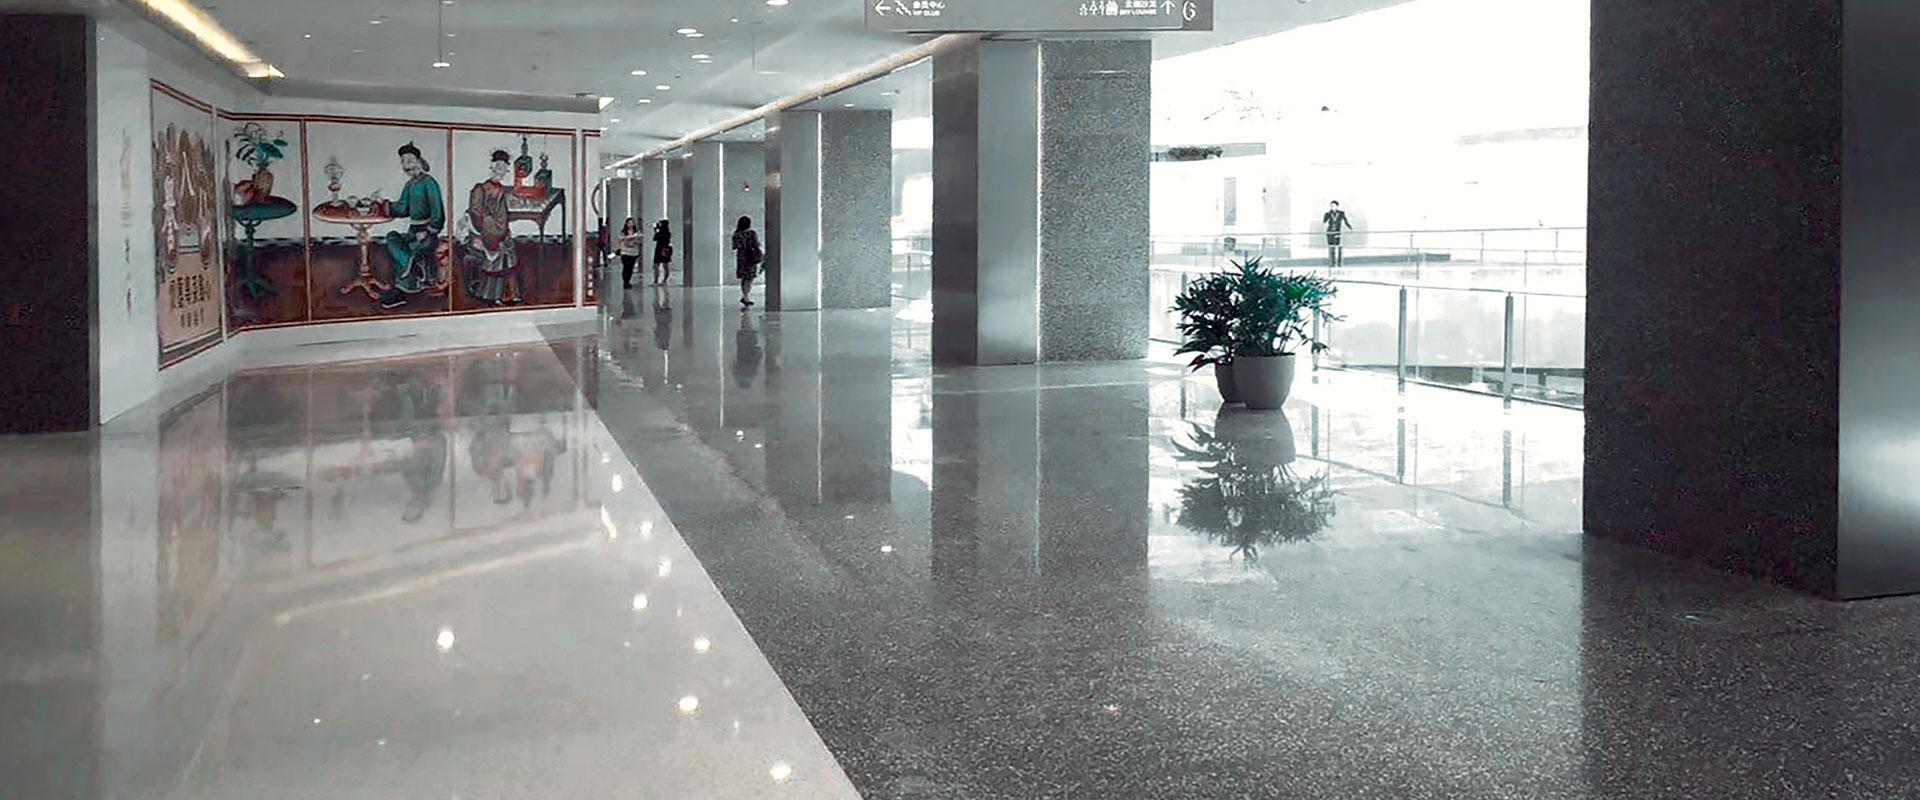 AGGLOTECH-progetto-mall-mixc-crcity-slider-1